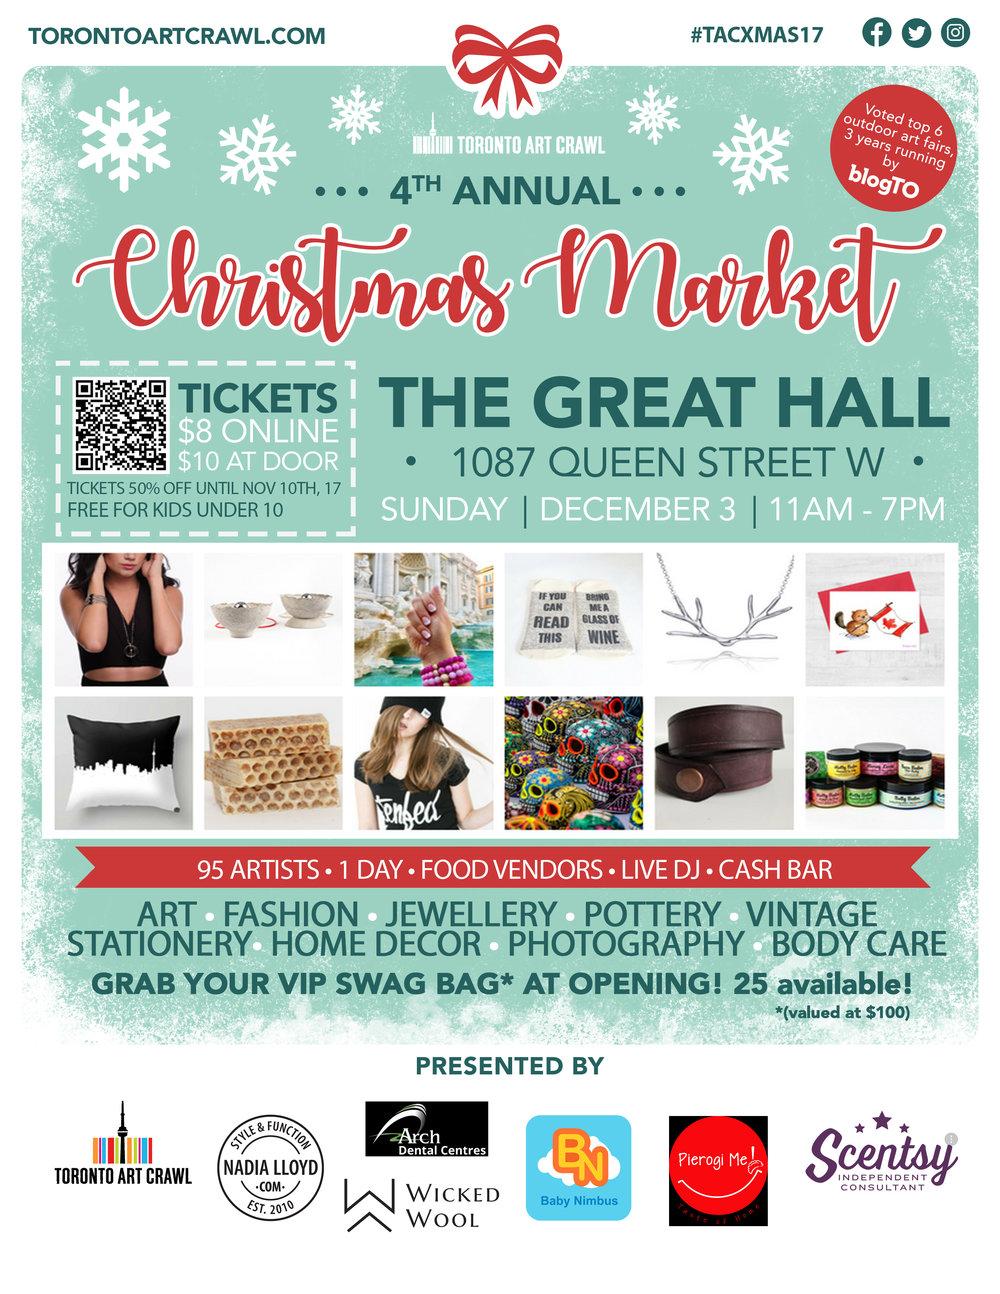 Toronto-Art-Crawl-Christmas-Market+2017.jpg